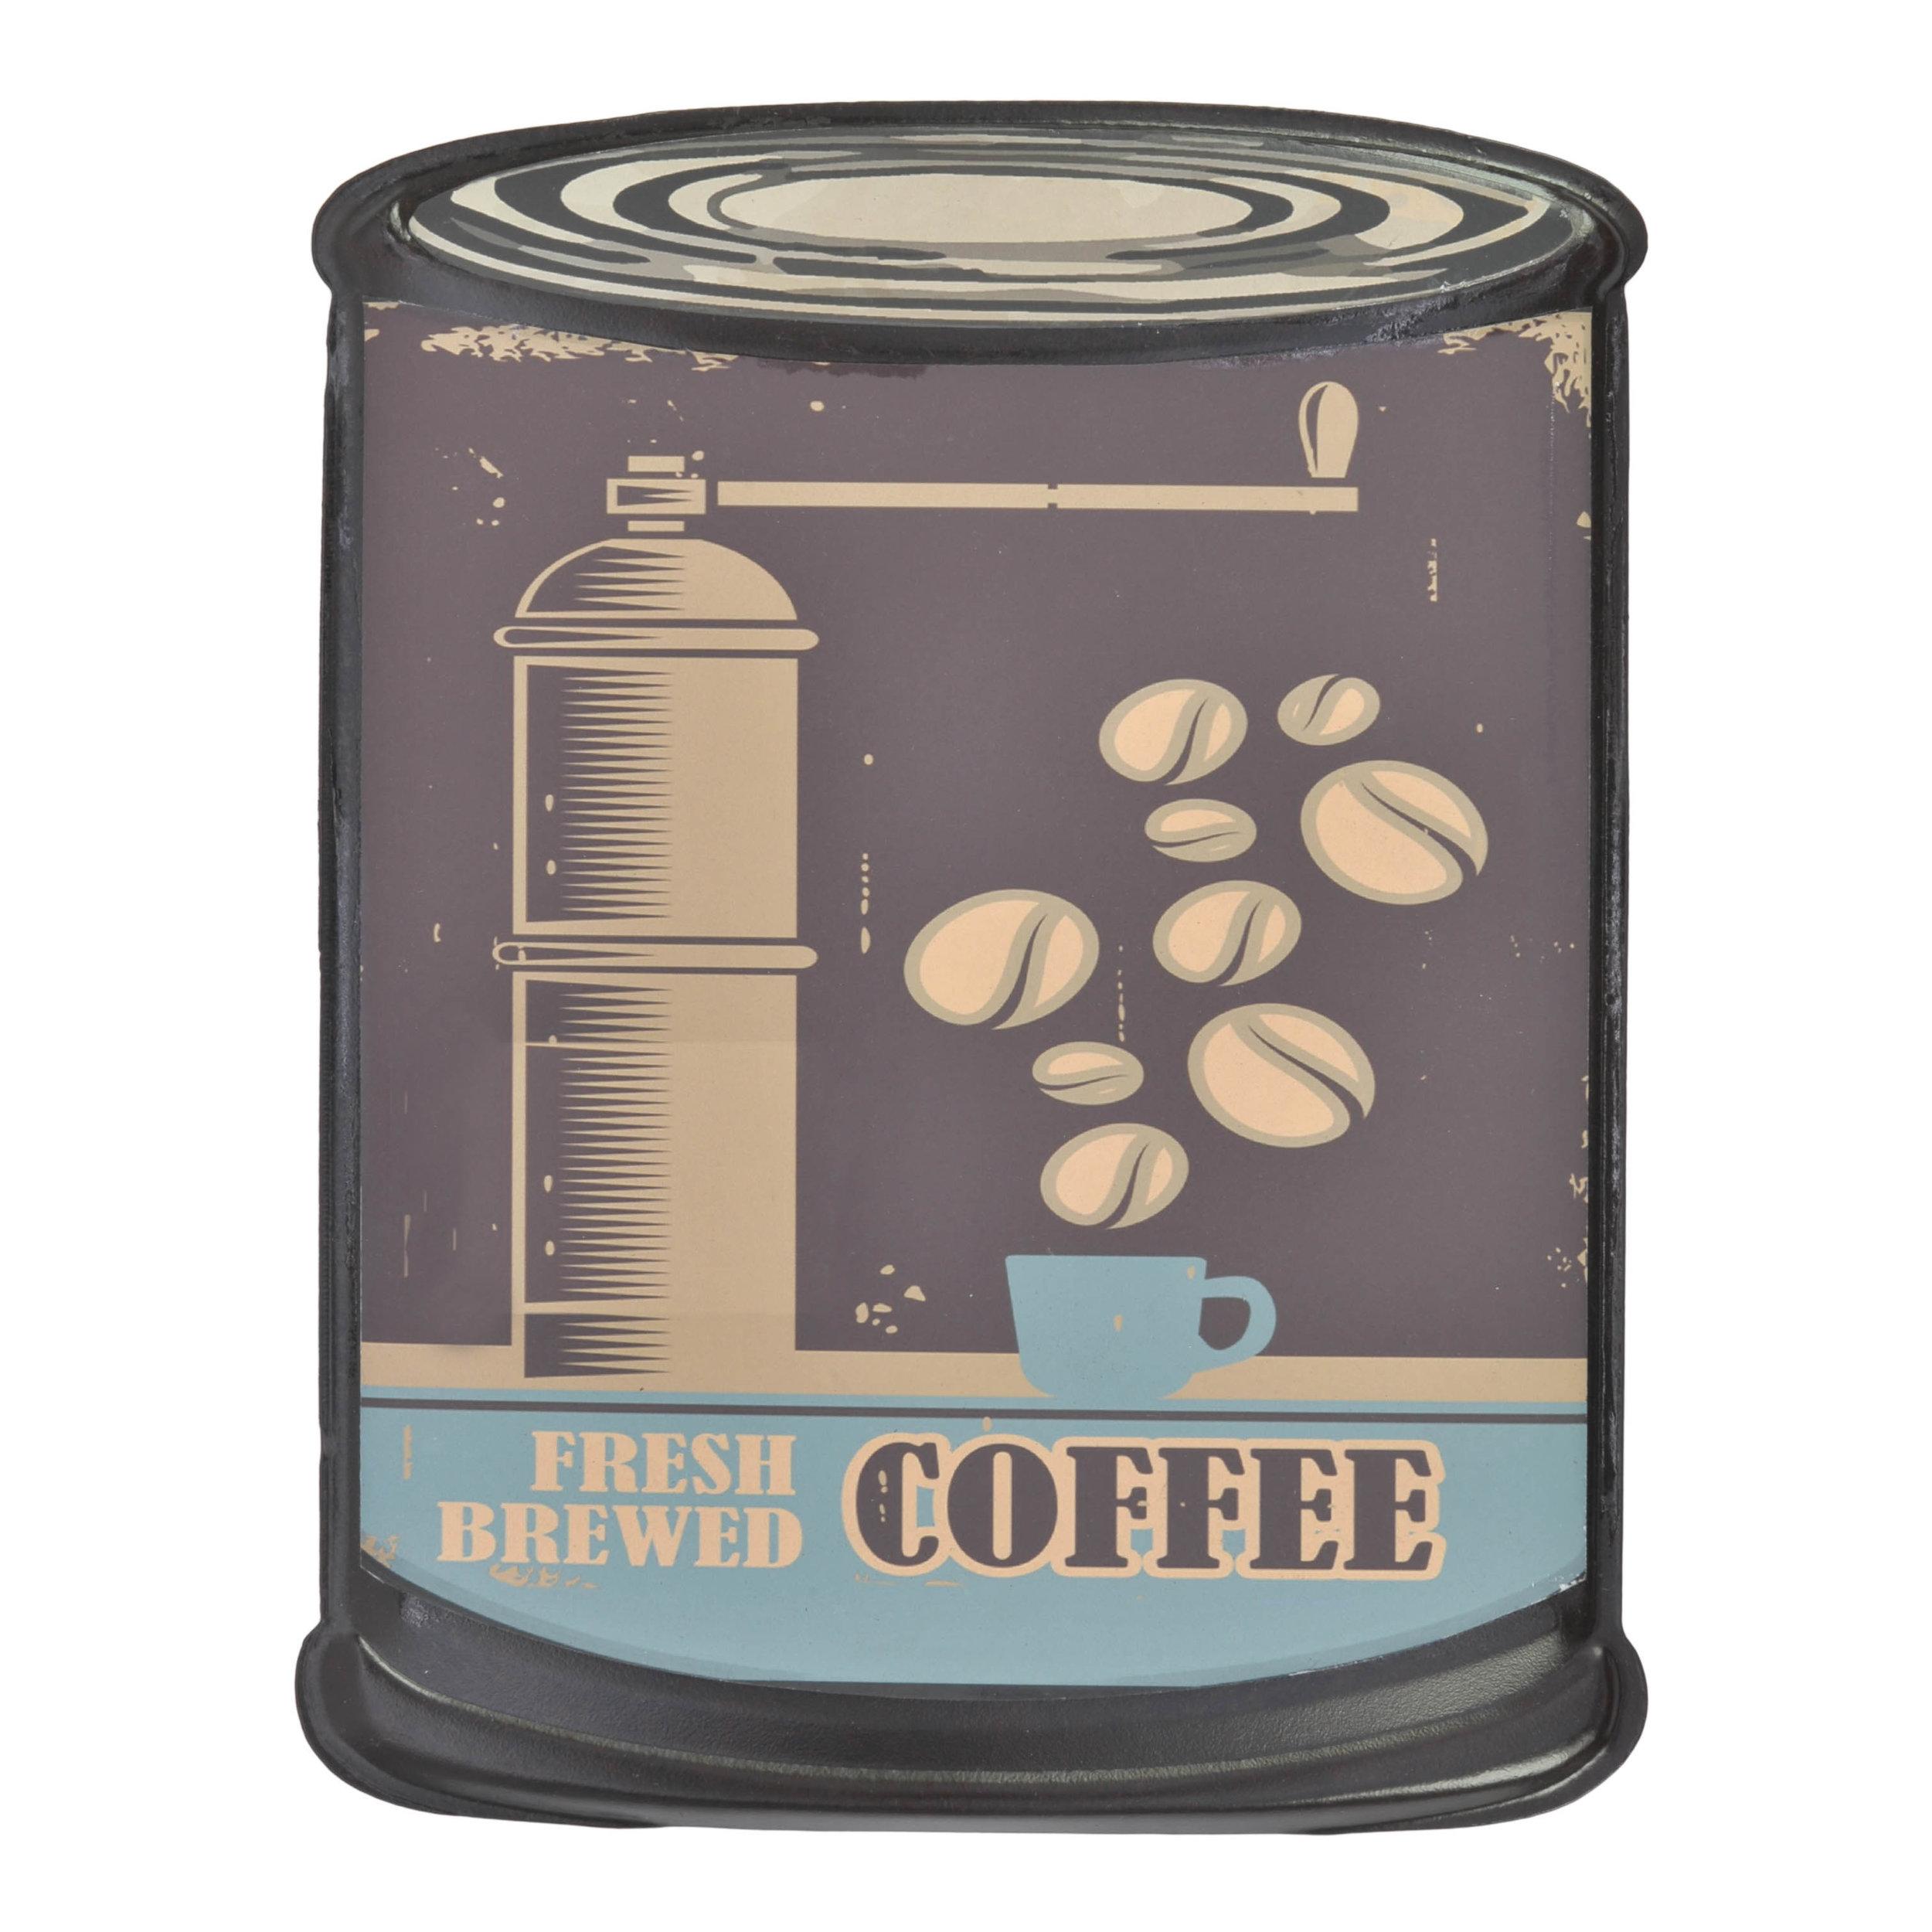 €9 METAL WALL DECOR 'COFFEE' 20X26